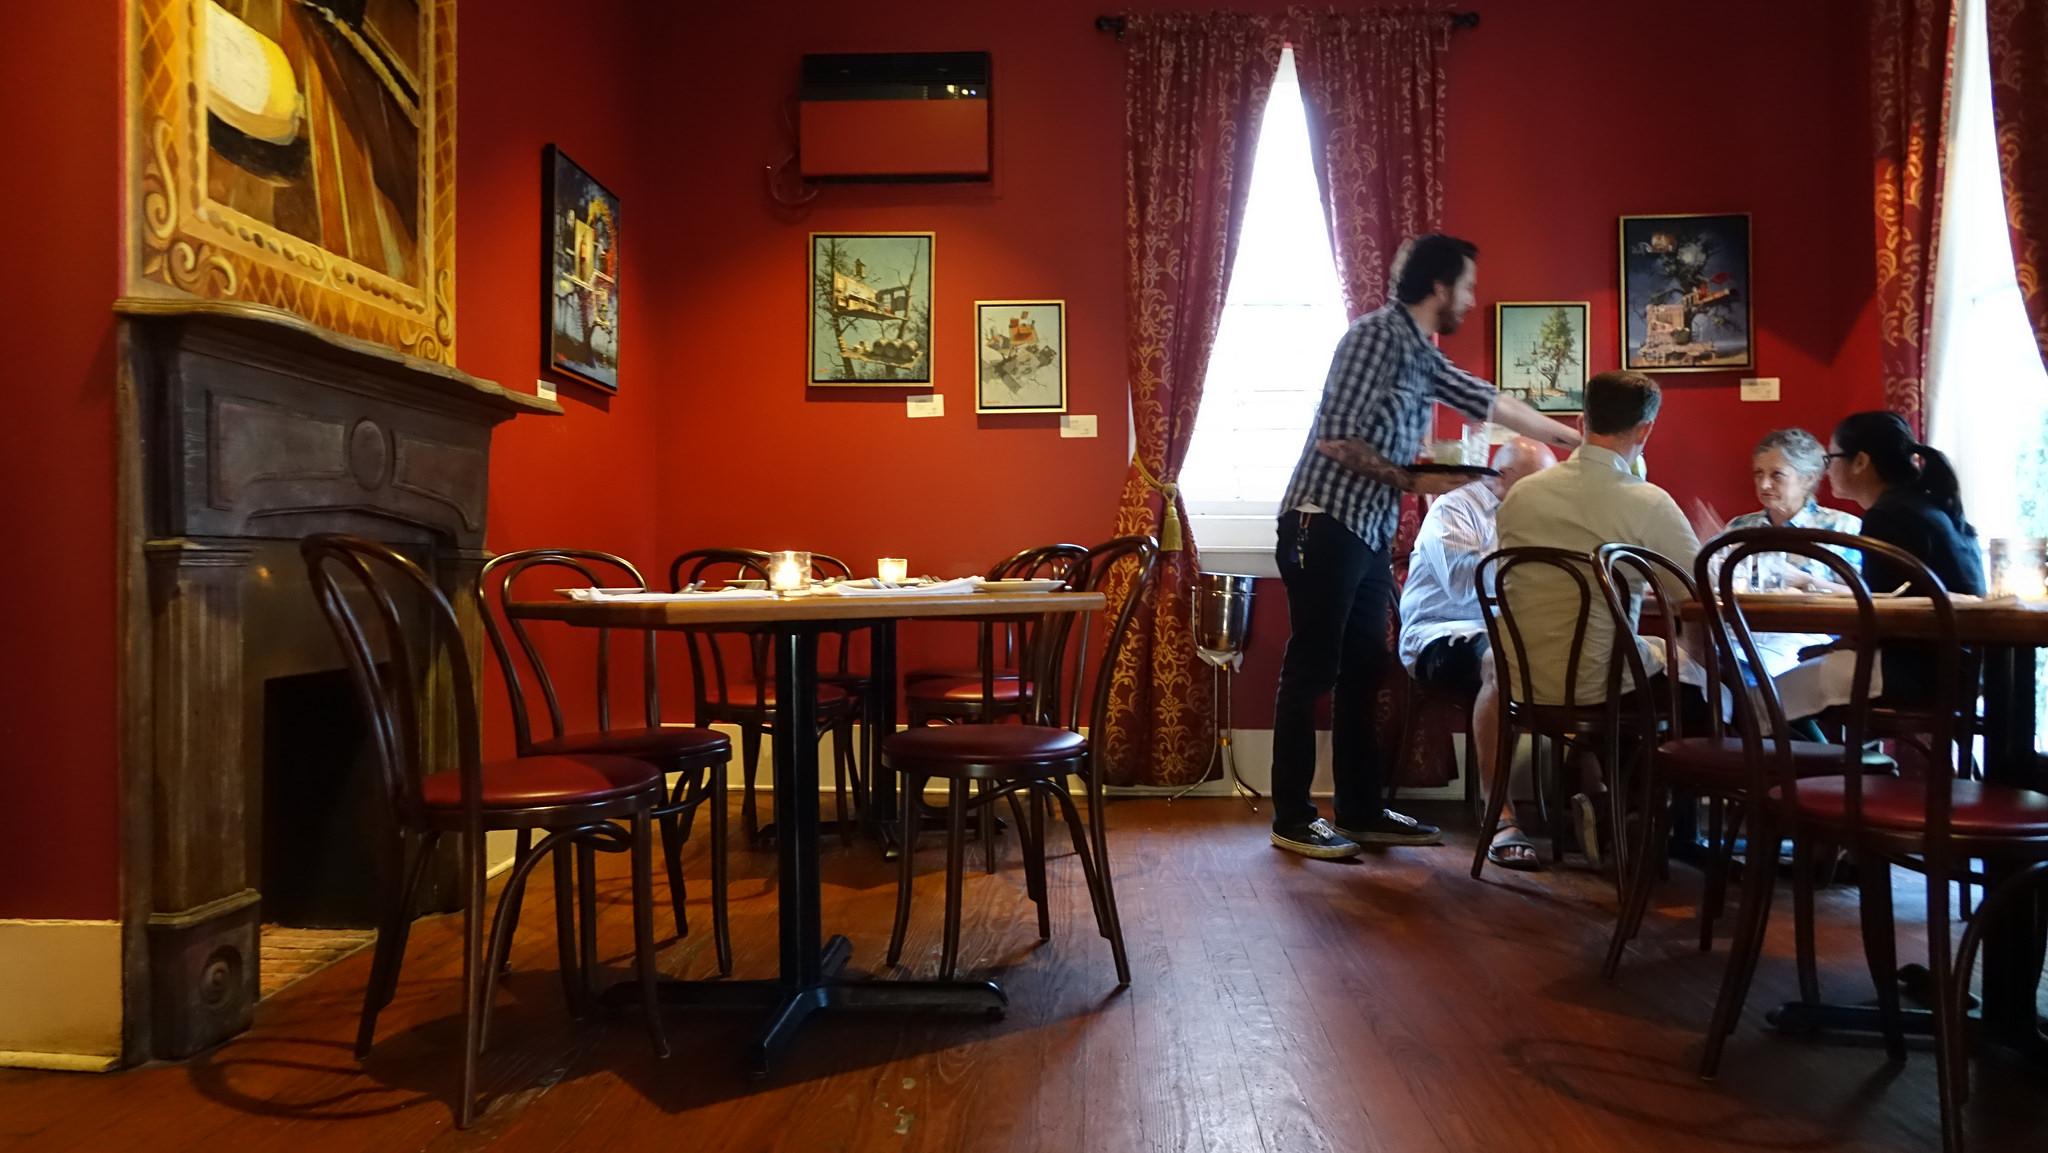 Dante's Kitchen. (Photo: Paul Broussard)